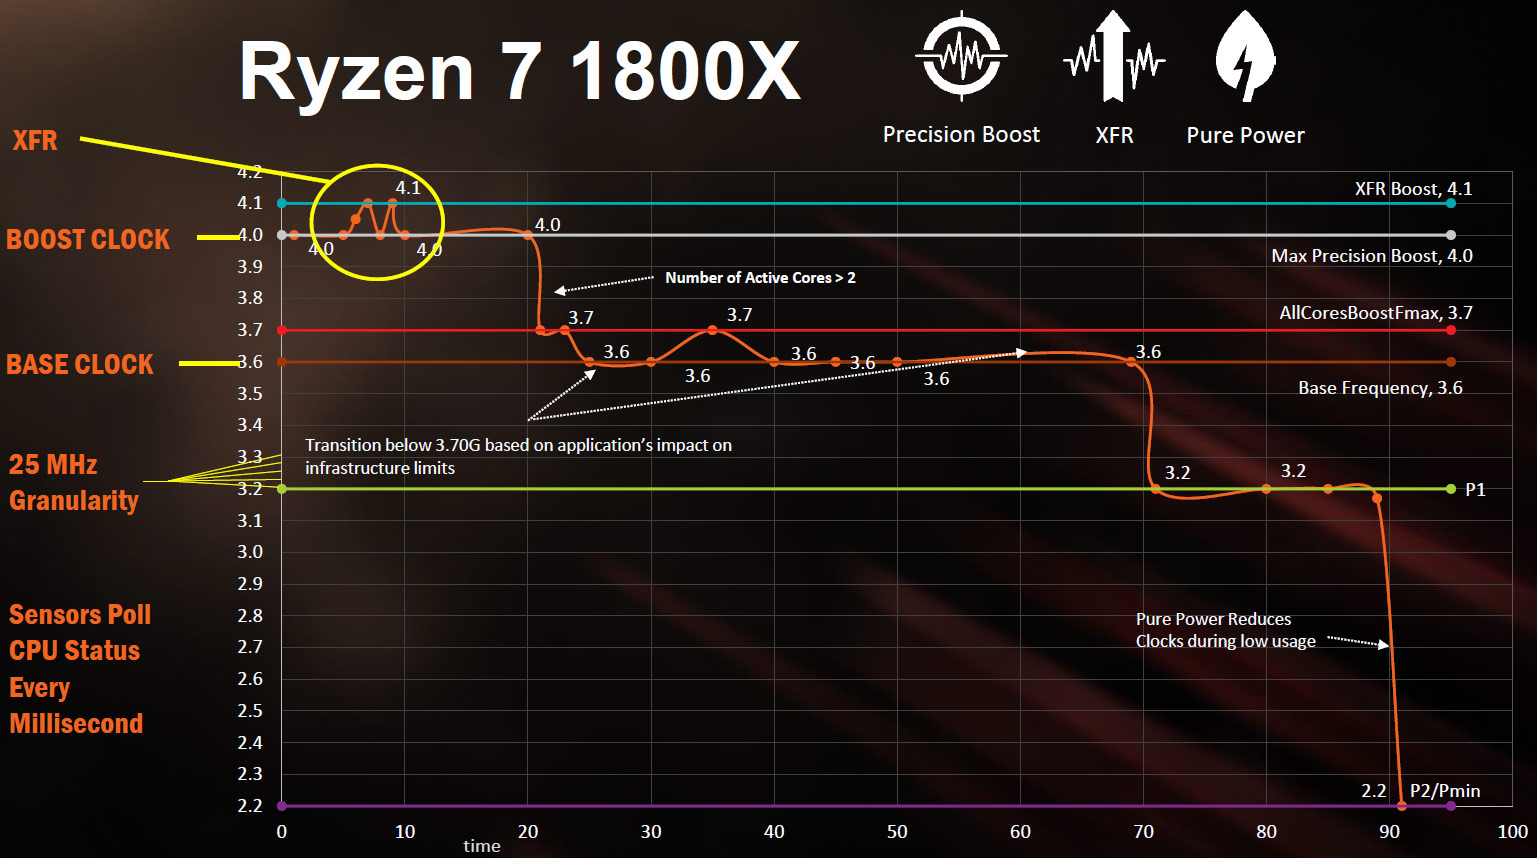 AMD Ryzen 7 1800X, 1700X and 1700 Processor Review - Page 2 of 15 - Legit ReviewsAMD Zen ...